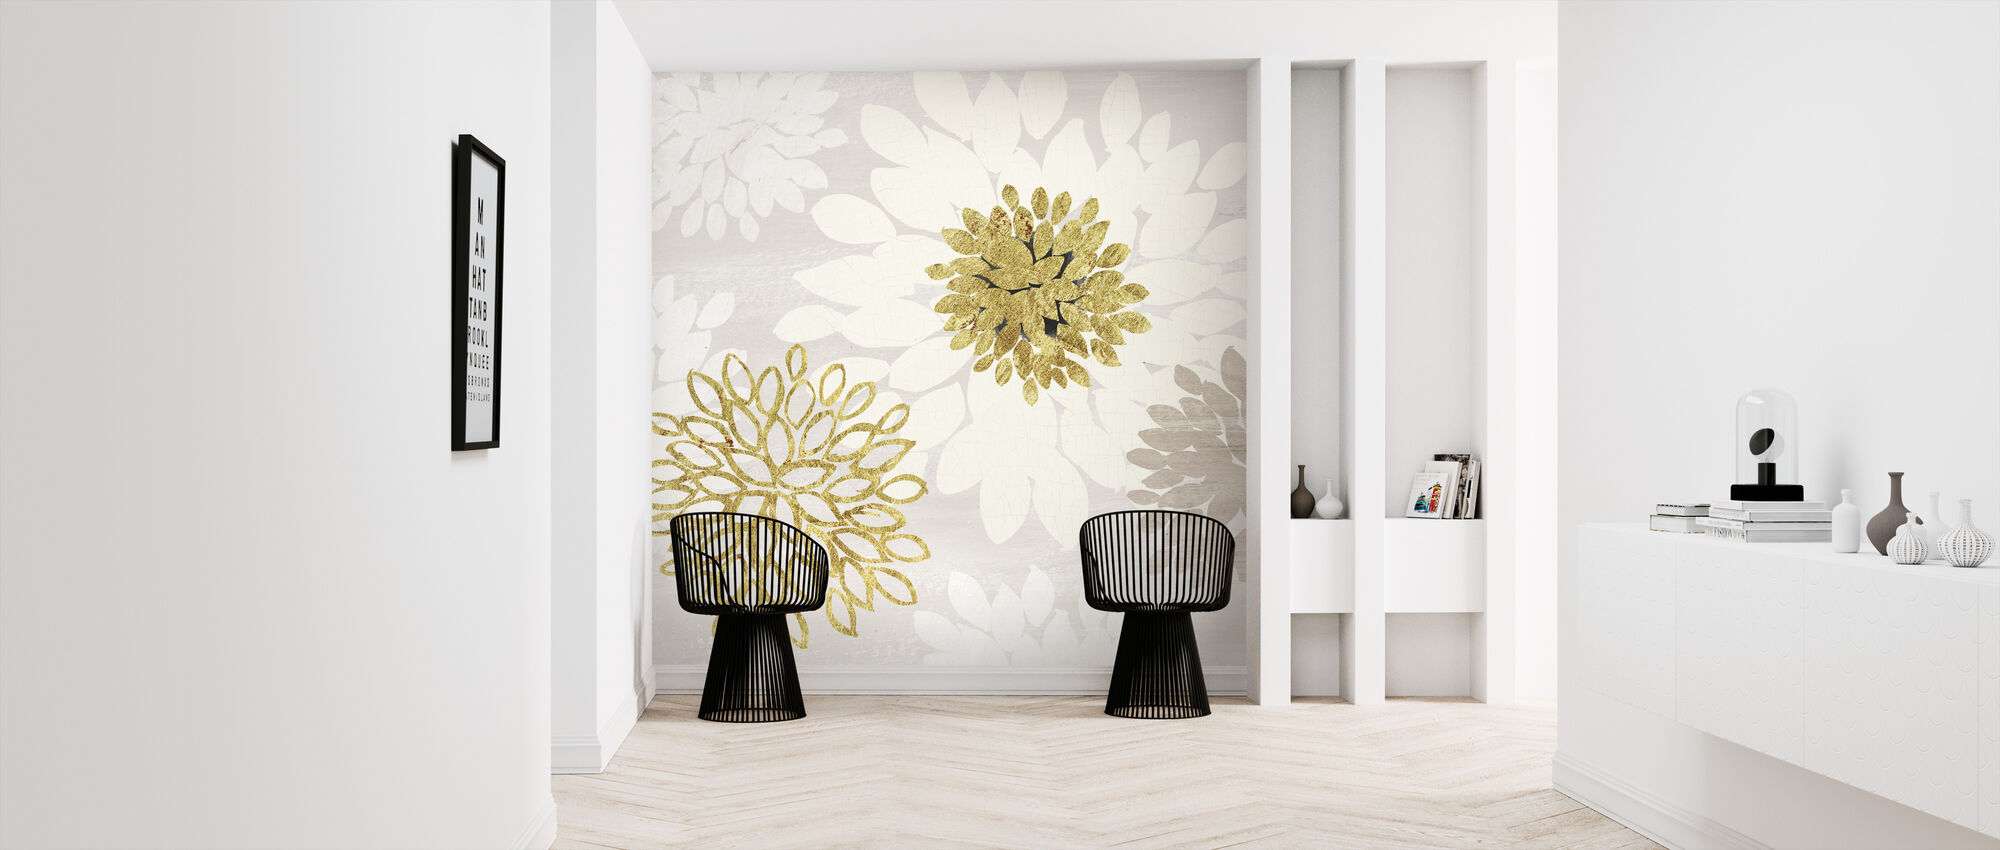 Gilded Aesthetic Bloom - Wallpaper - Hallway